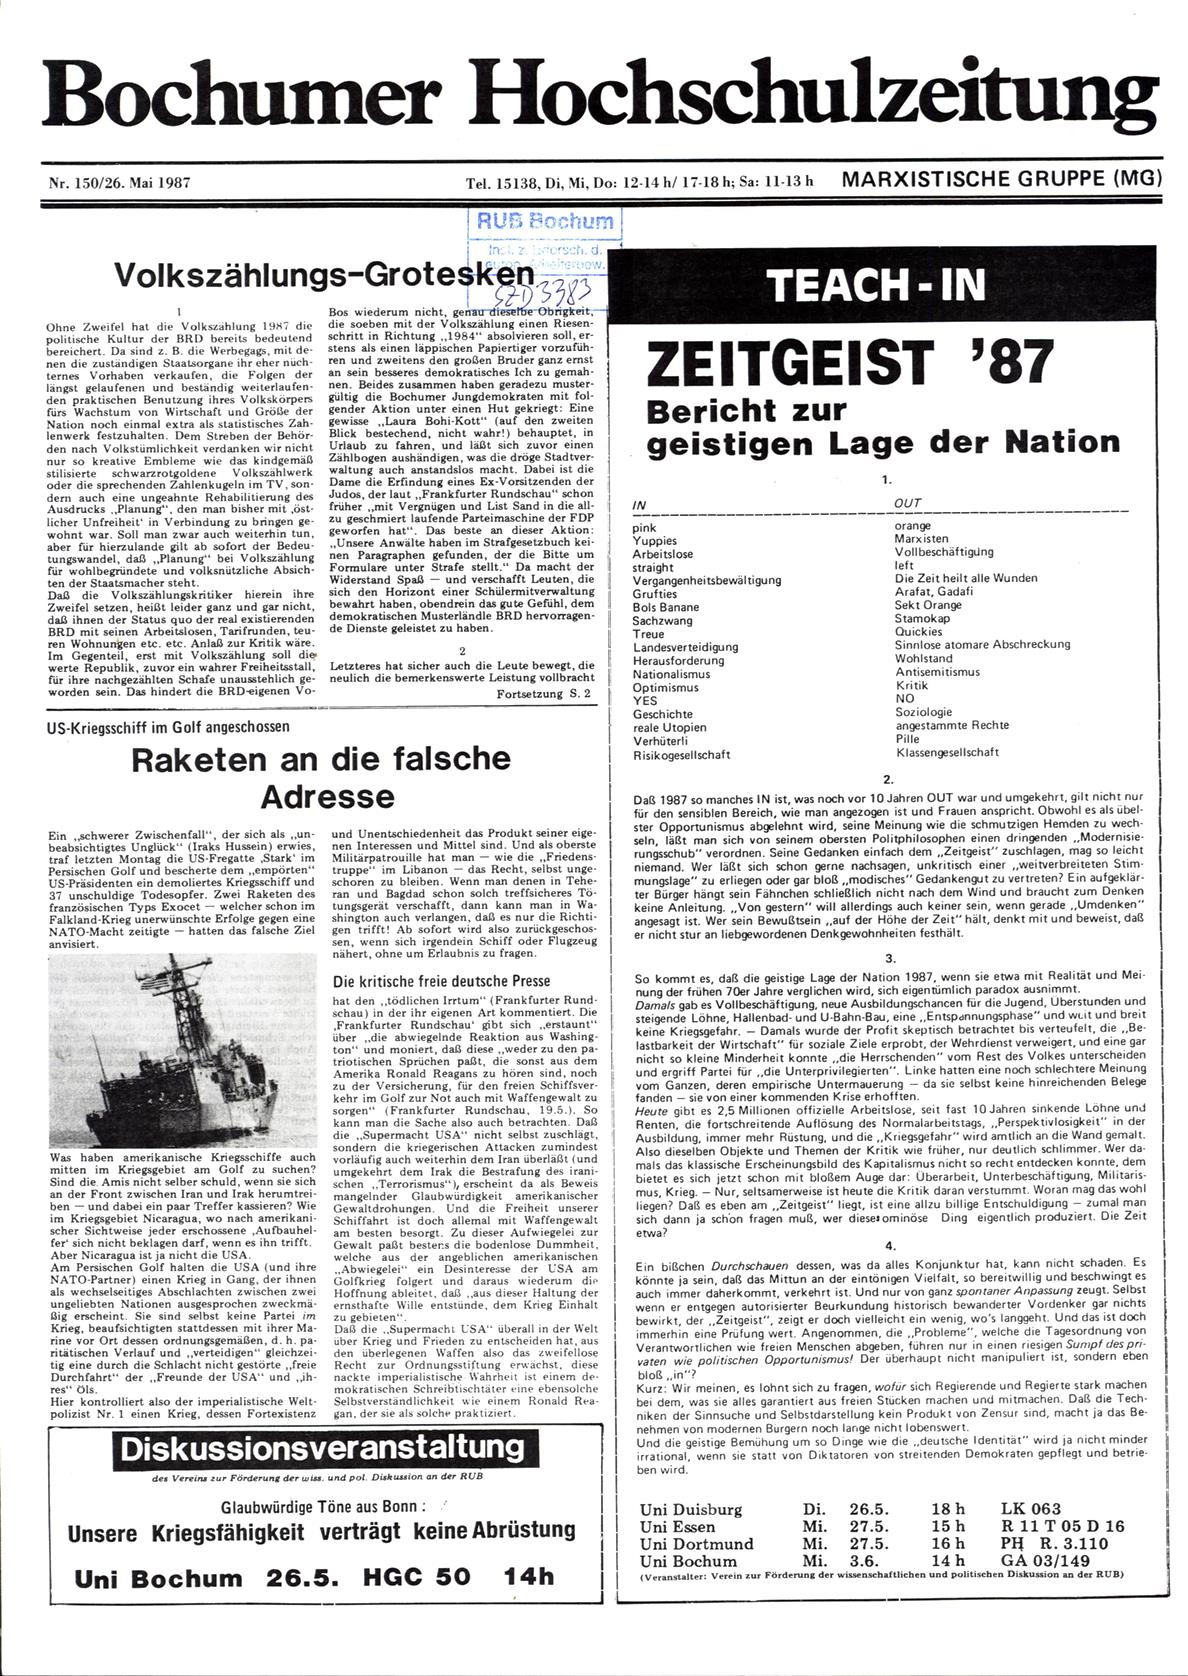 Bochum_BHZ_19870526_150_001